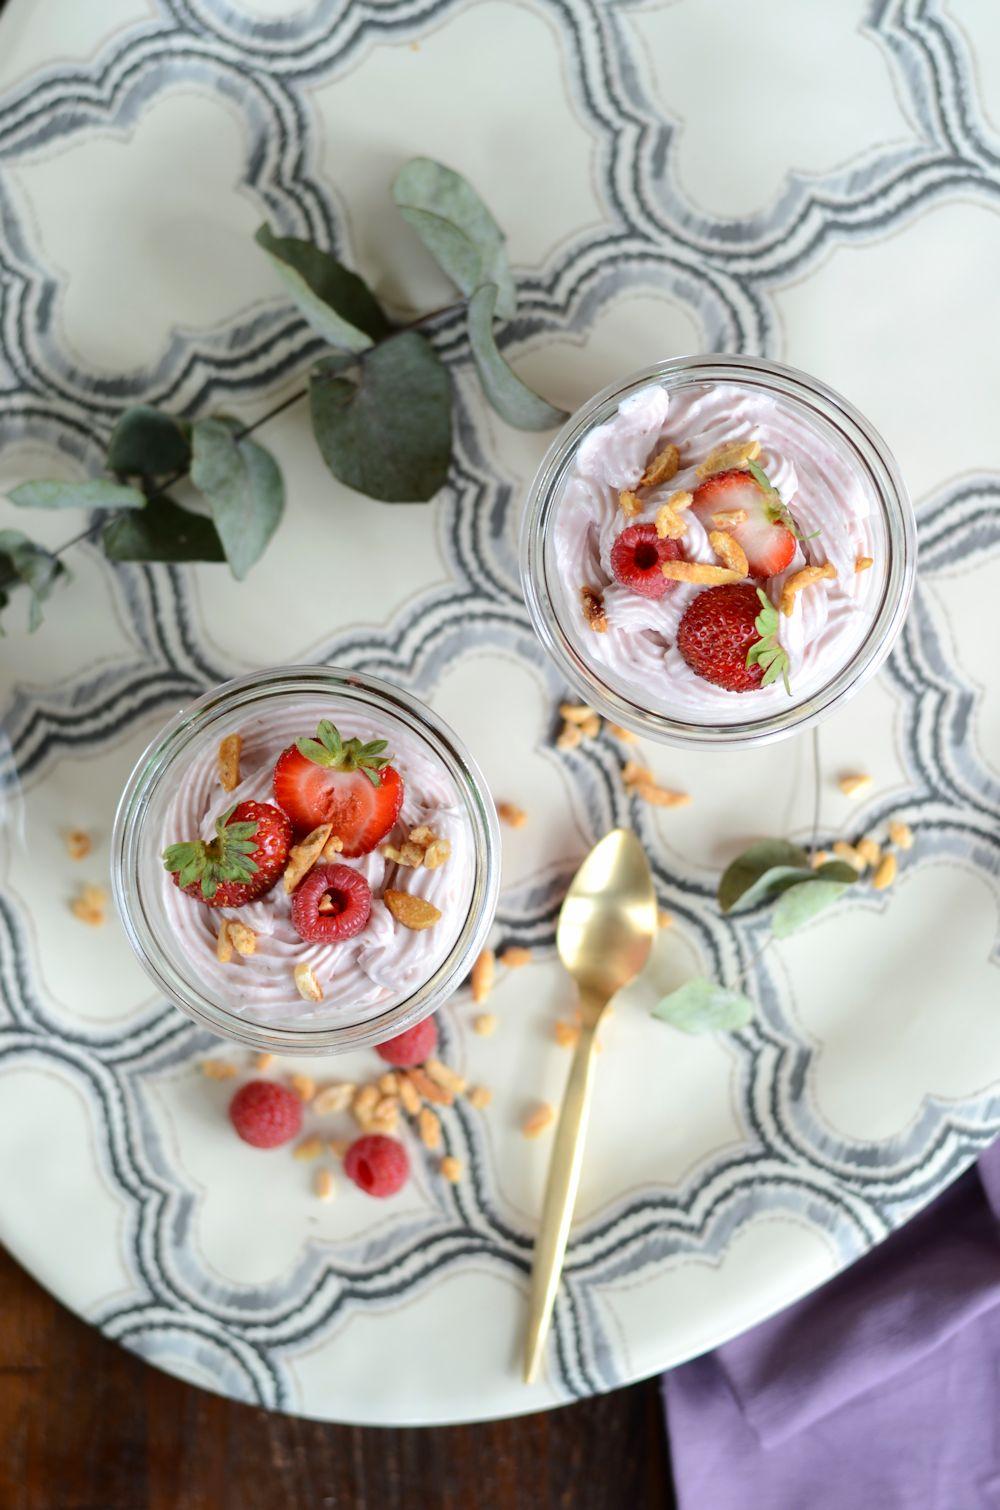 Verrine de Mousse de fraise, framboise et mascarpone